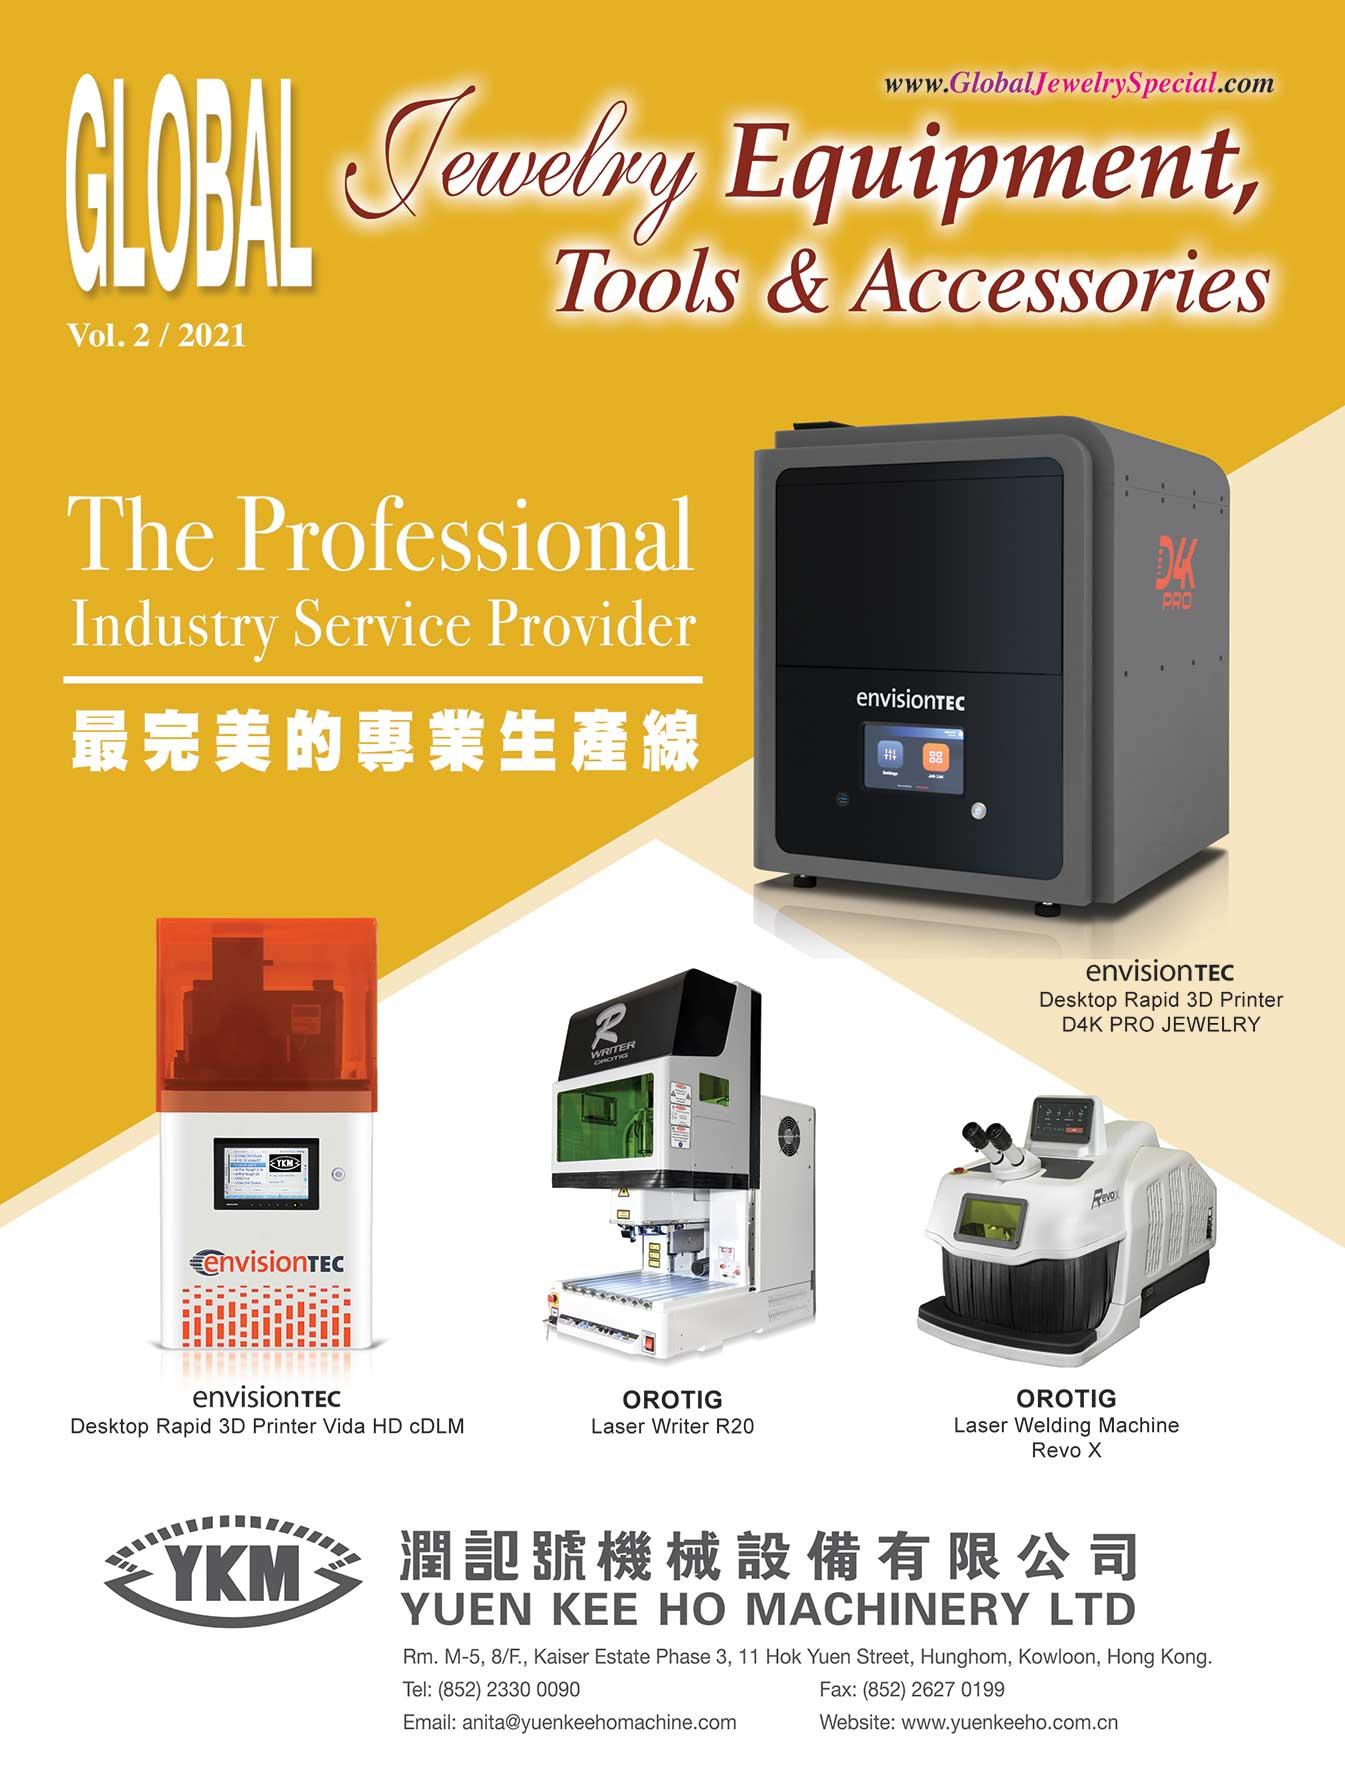 Global Equipment, Tools & Accessories